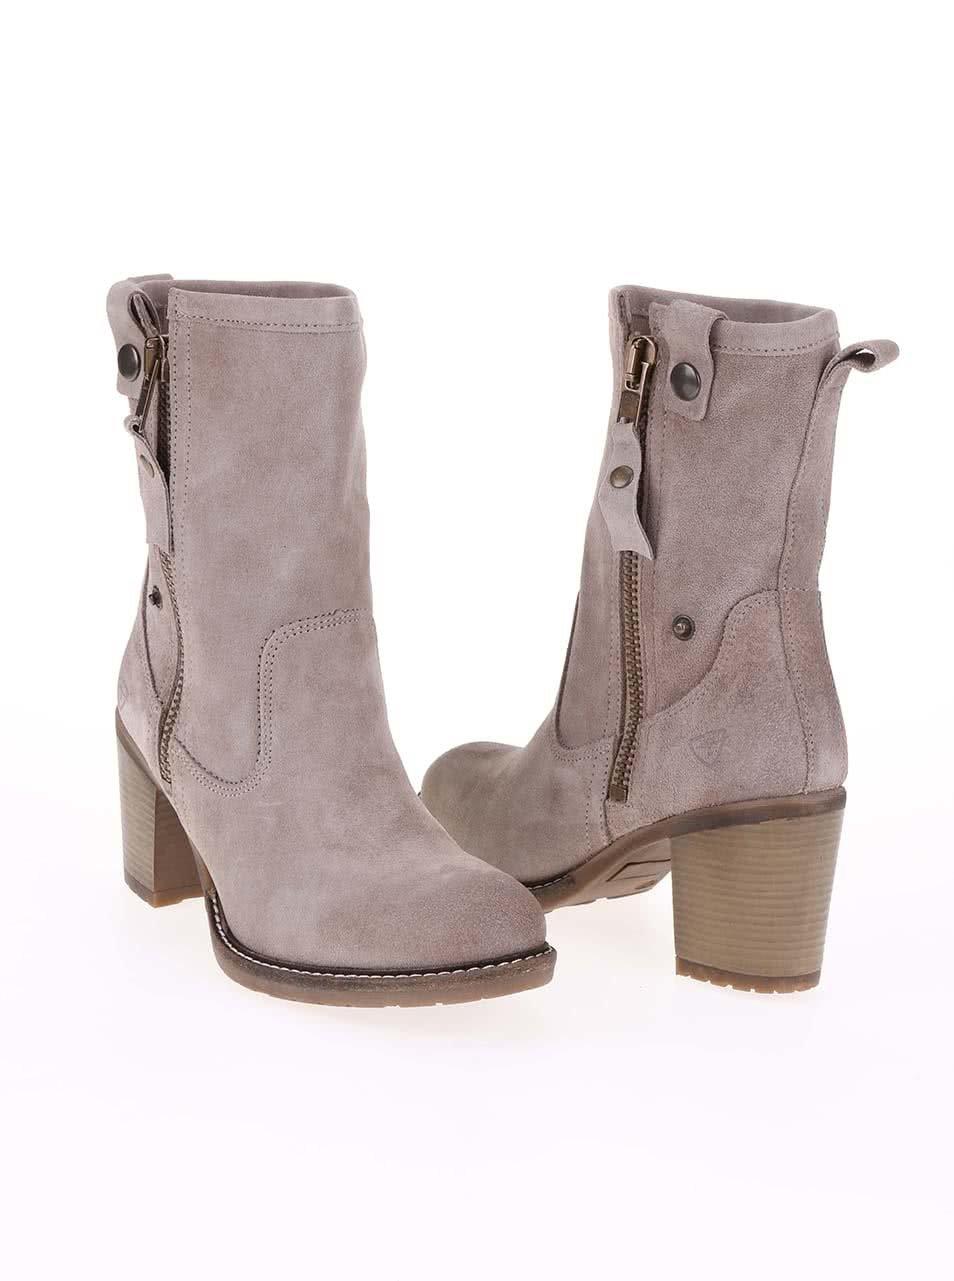 9a28d99925 Sivé kožené členkové topánky na podpätku Tamaris ...